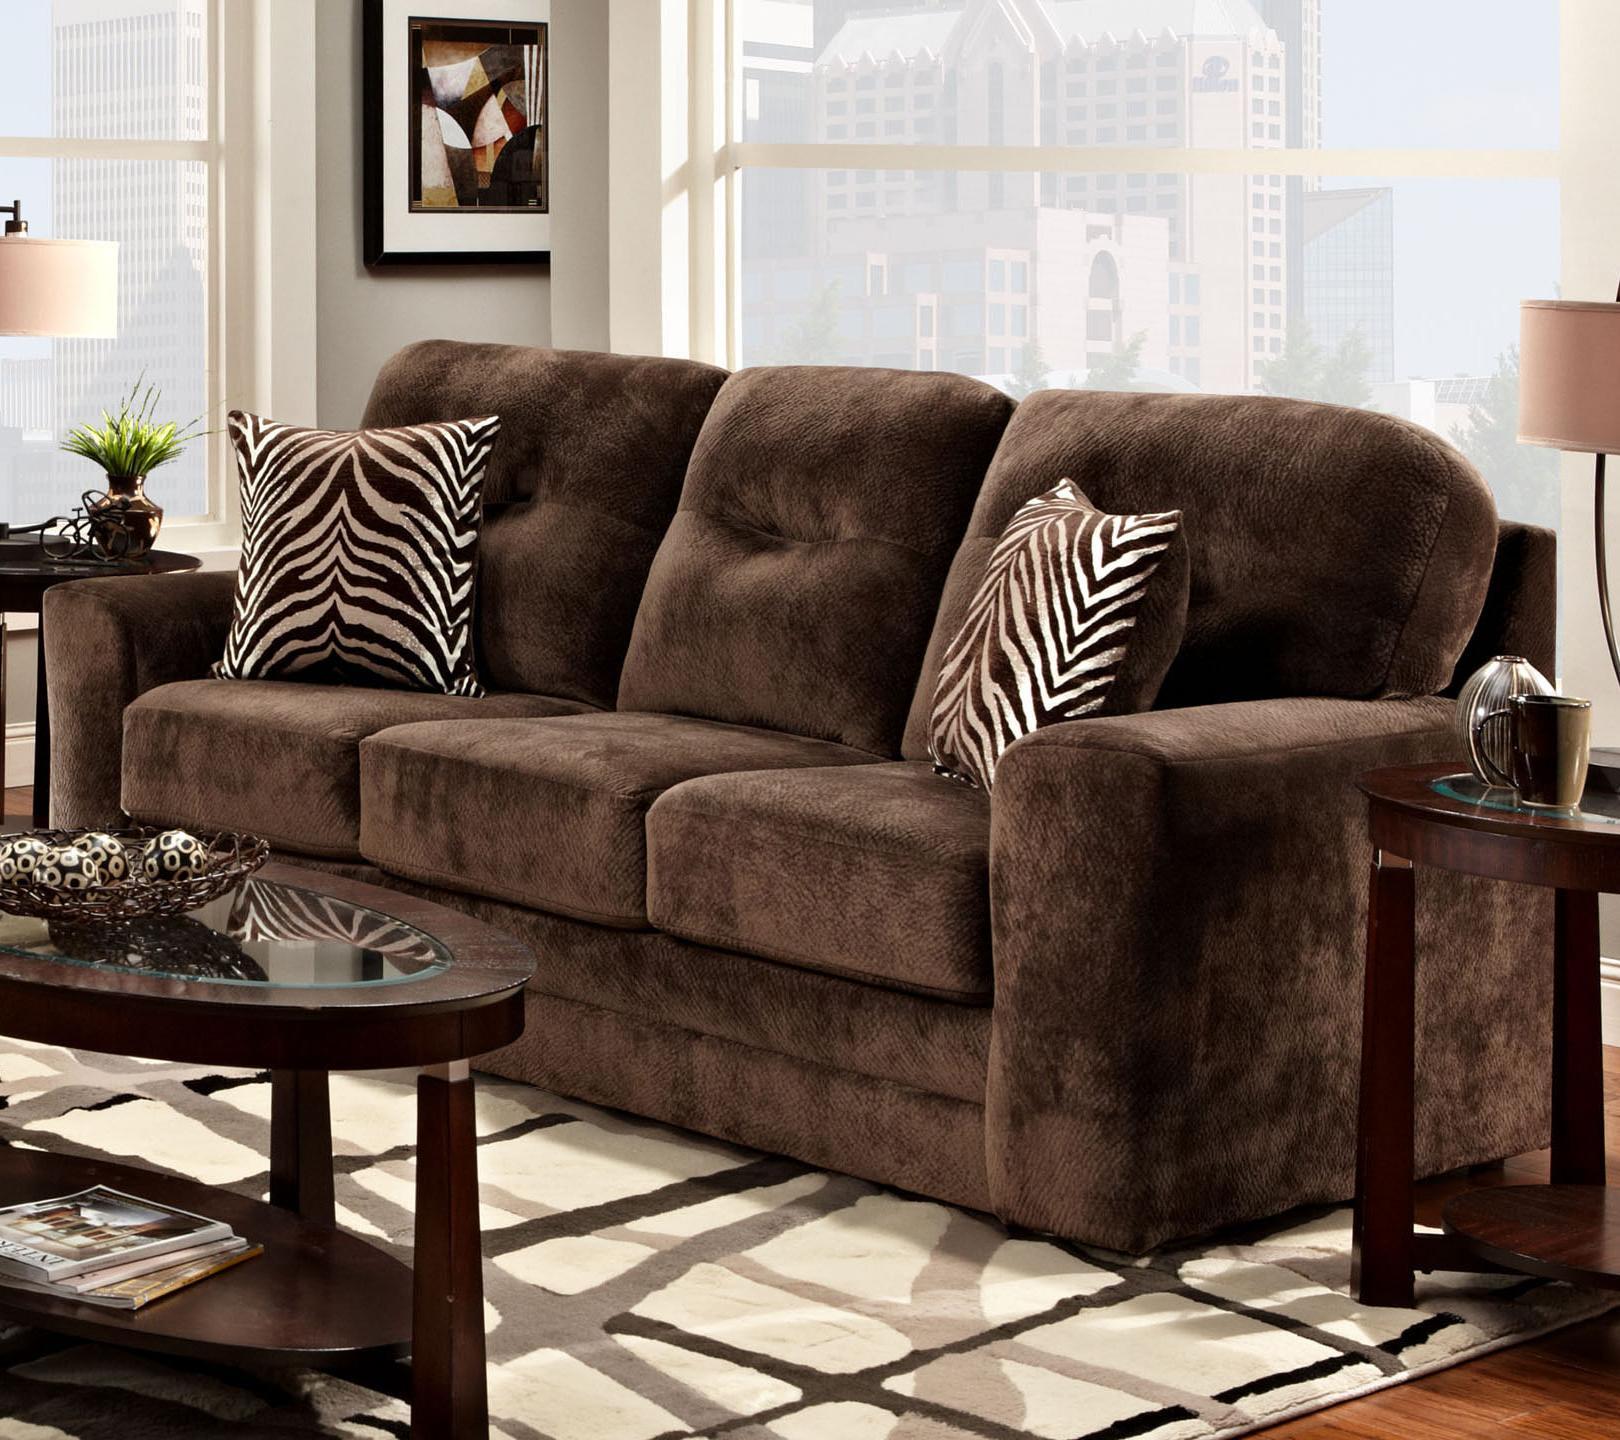 1600 Sofa by Washington Furniture at Lynn's Furniture & Mattress